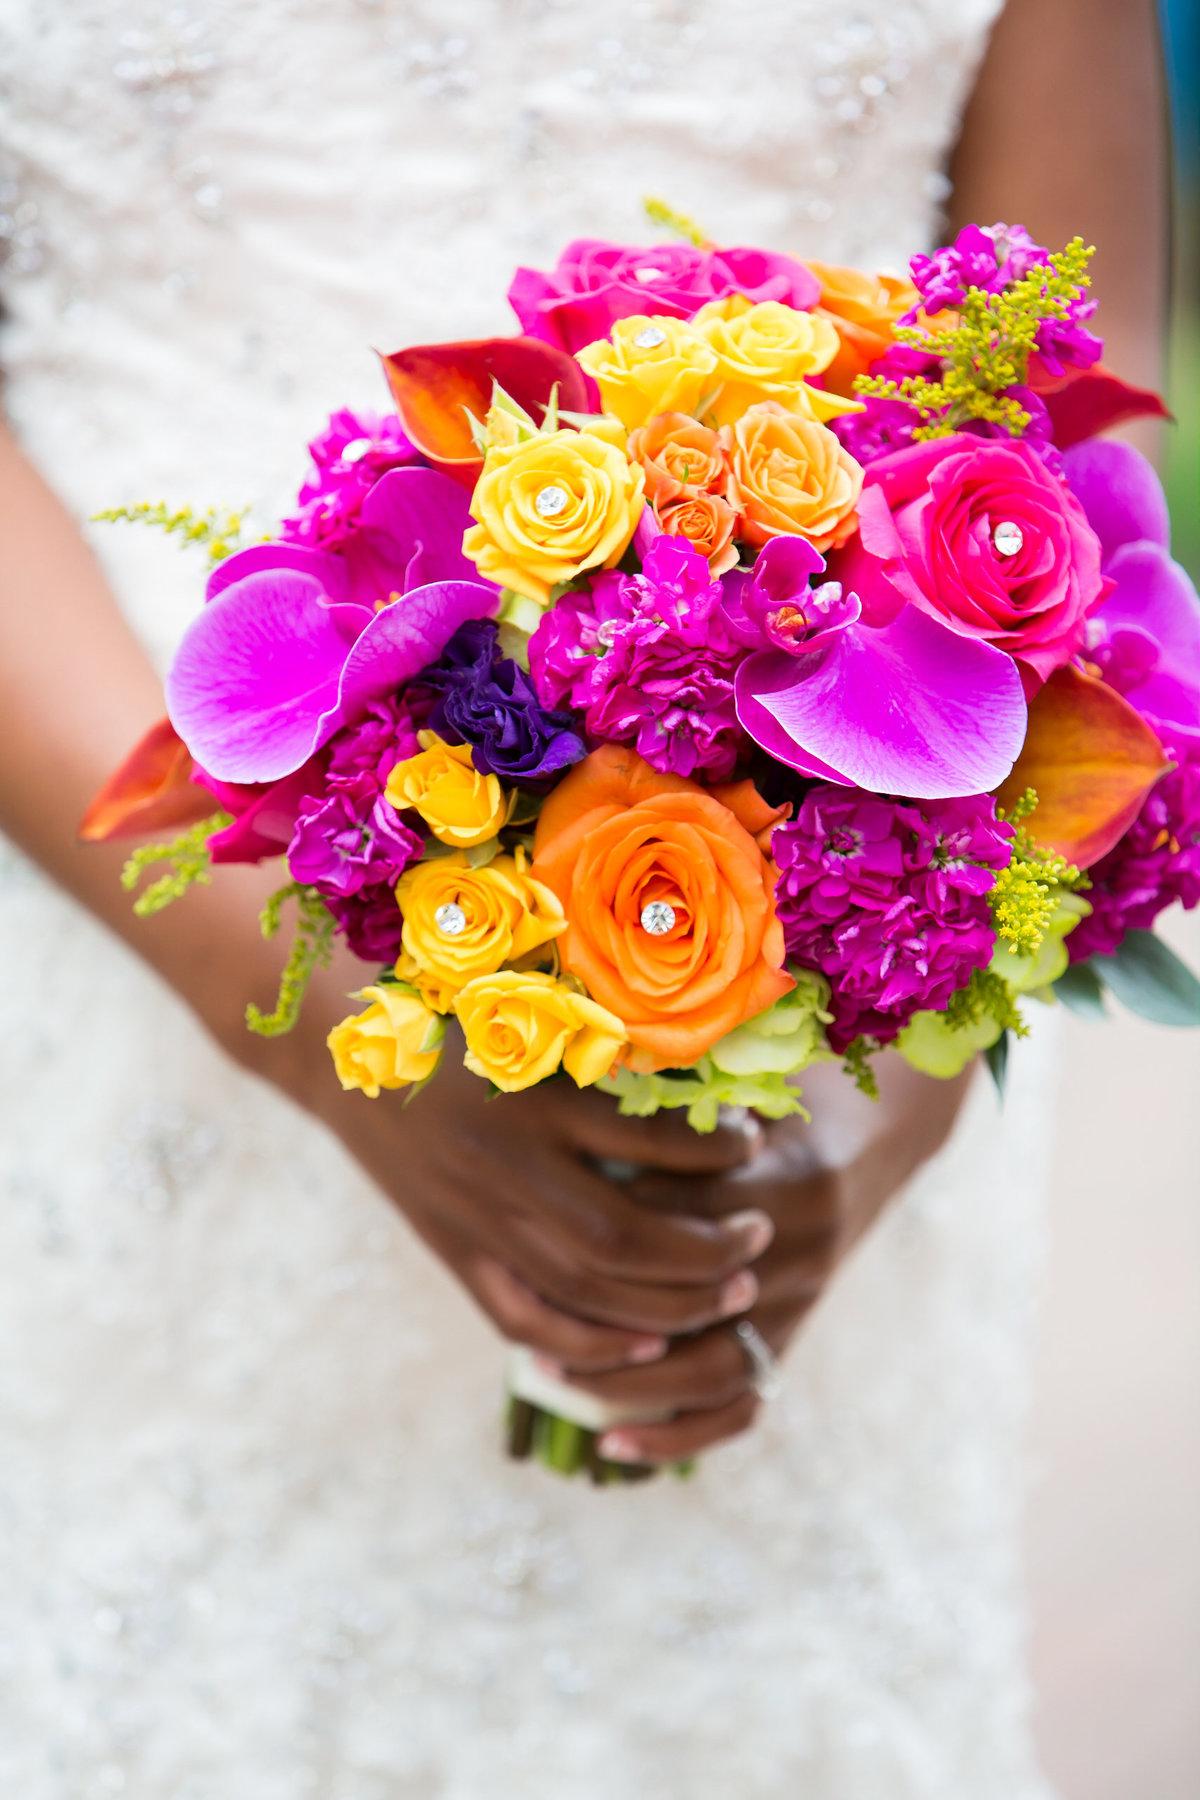 Nj Luxury Wedding Event Ideas K Barner Events Nyc Party Planner